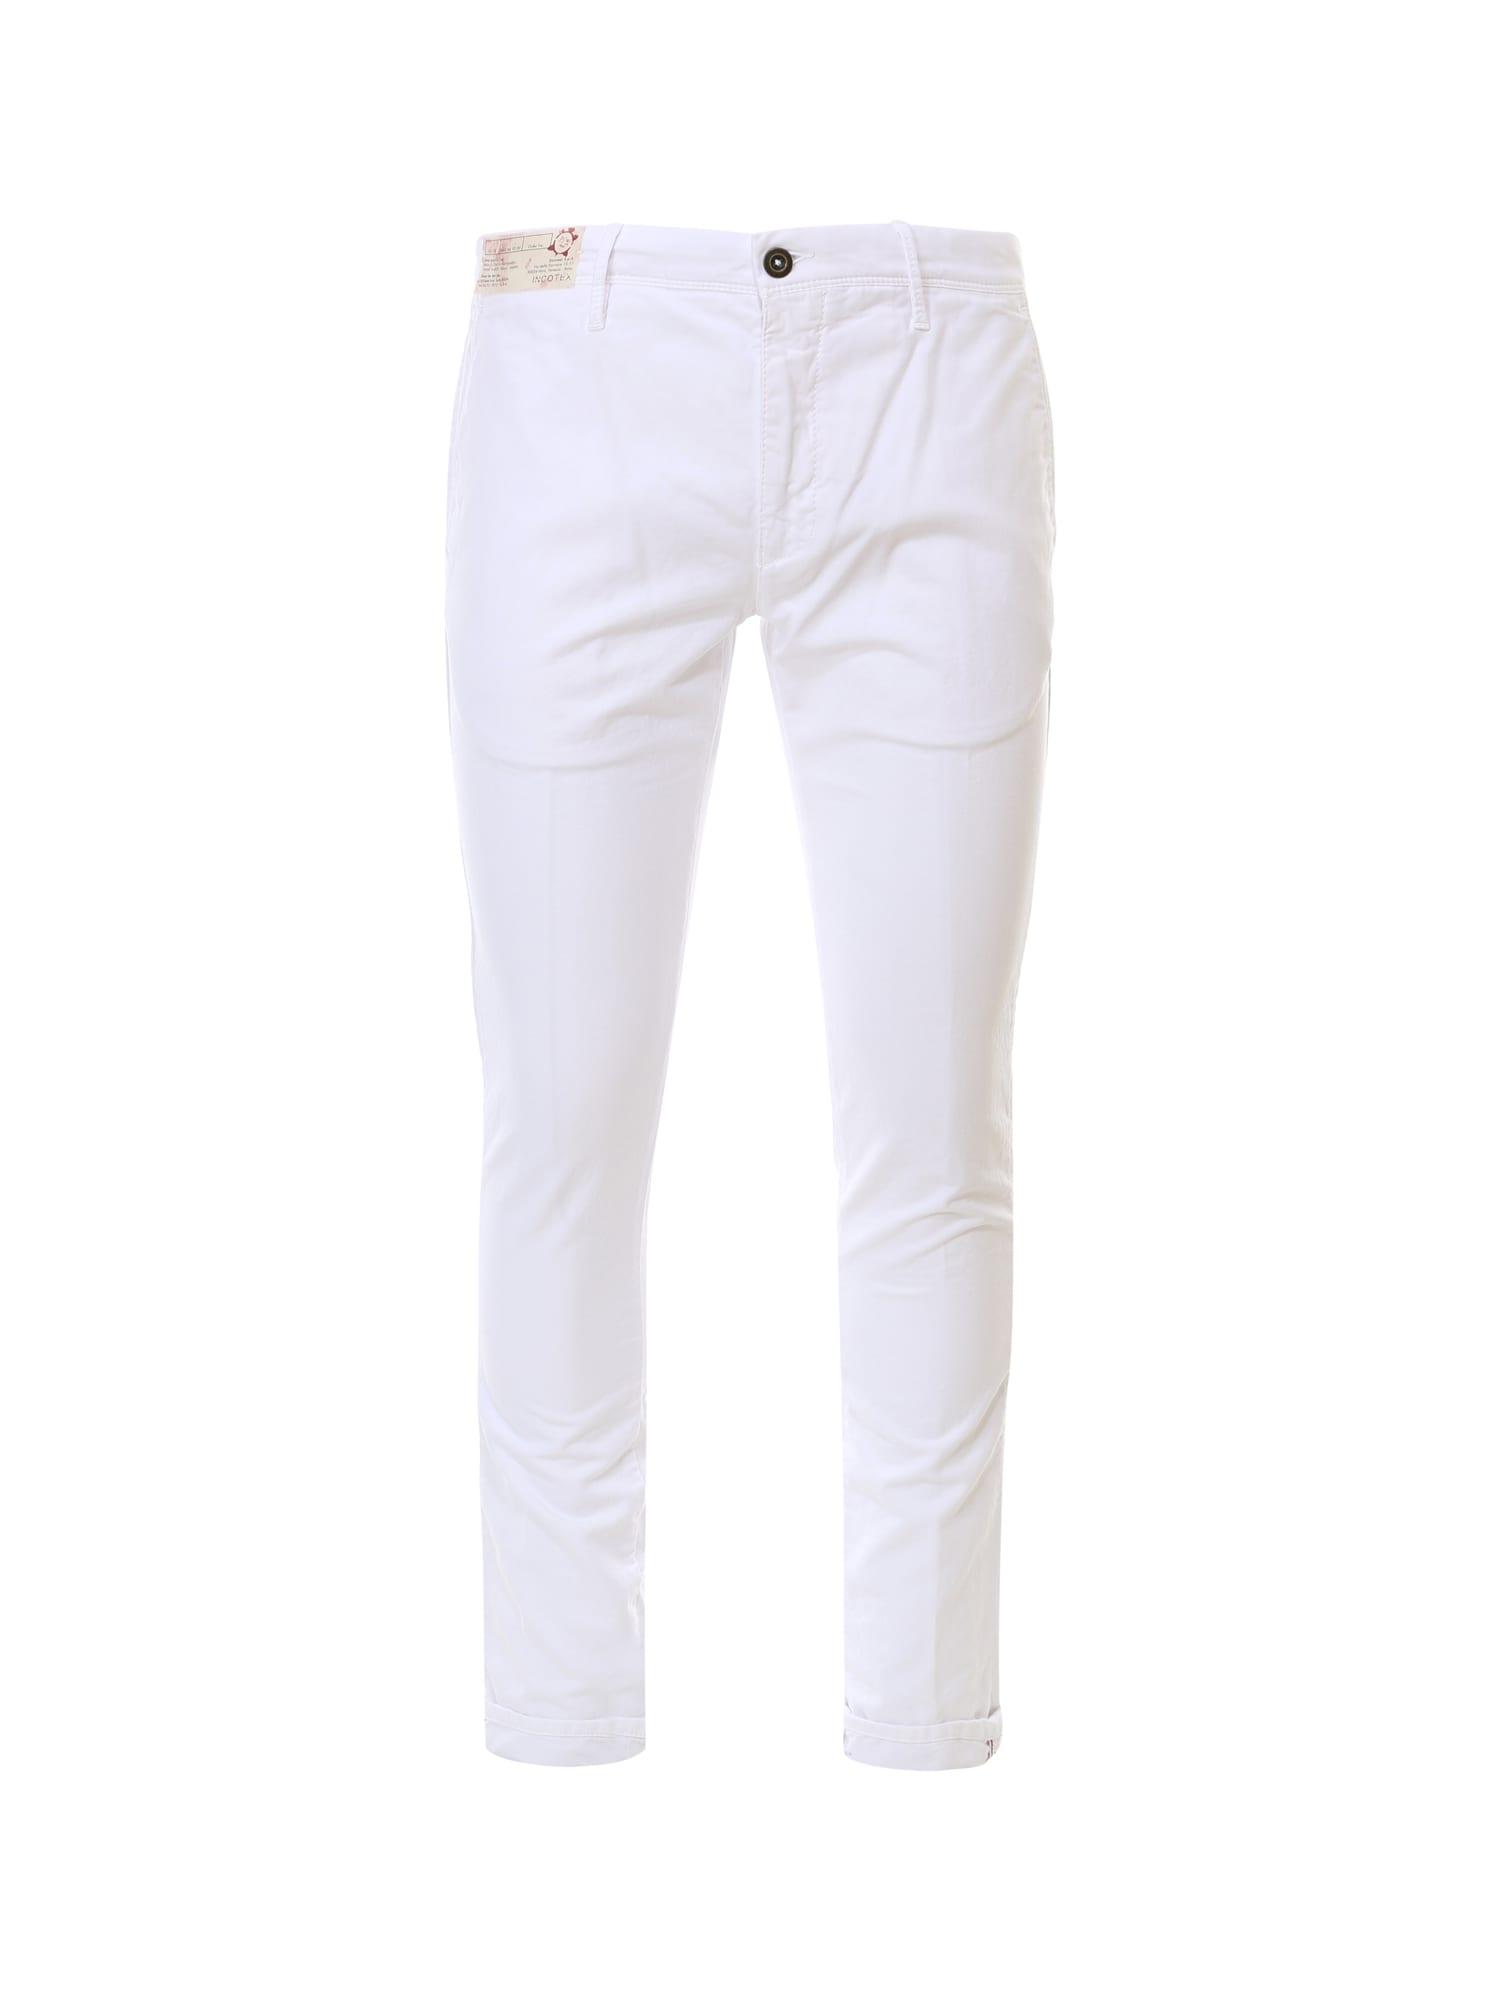 Incotex Trouser